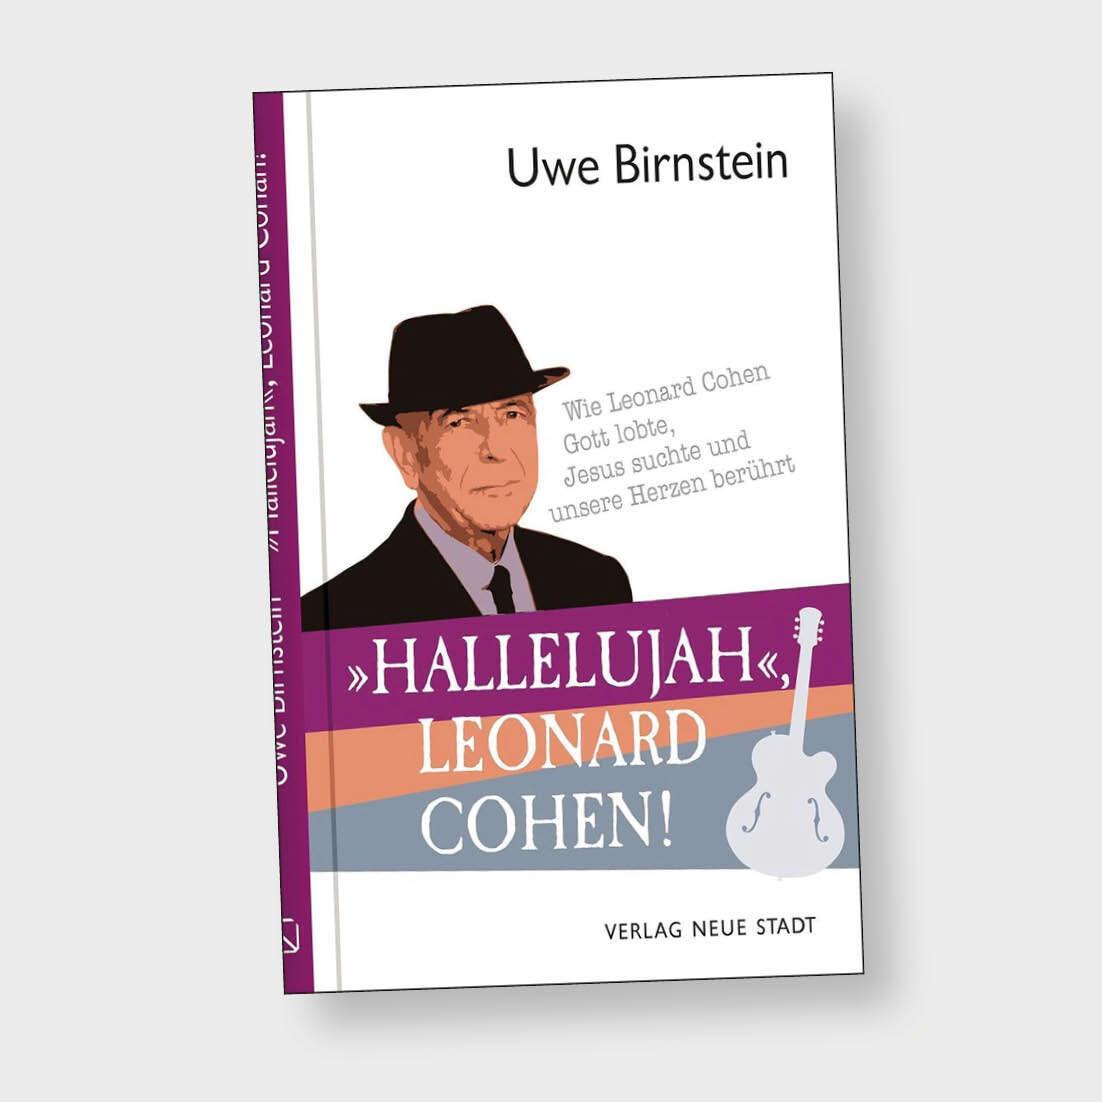 «Hallelujah», Leonard Cohen!</span><span>